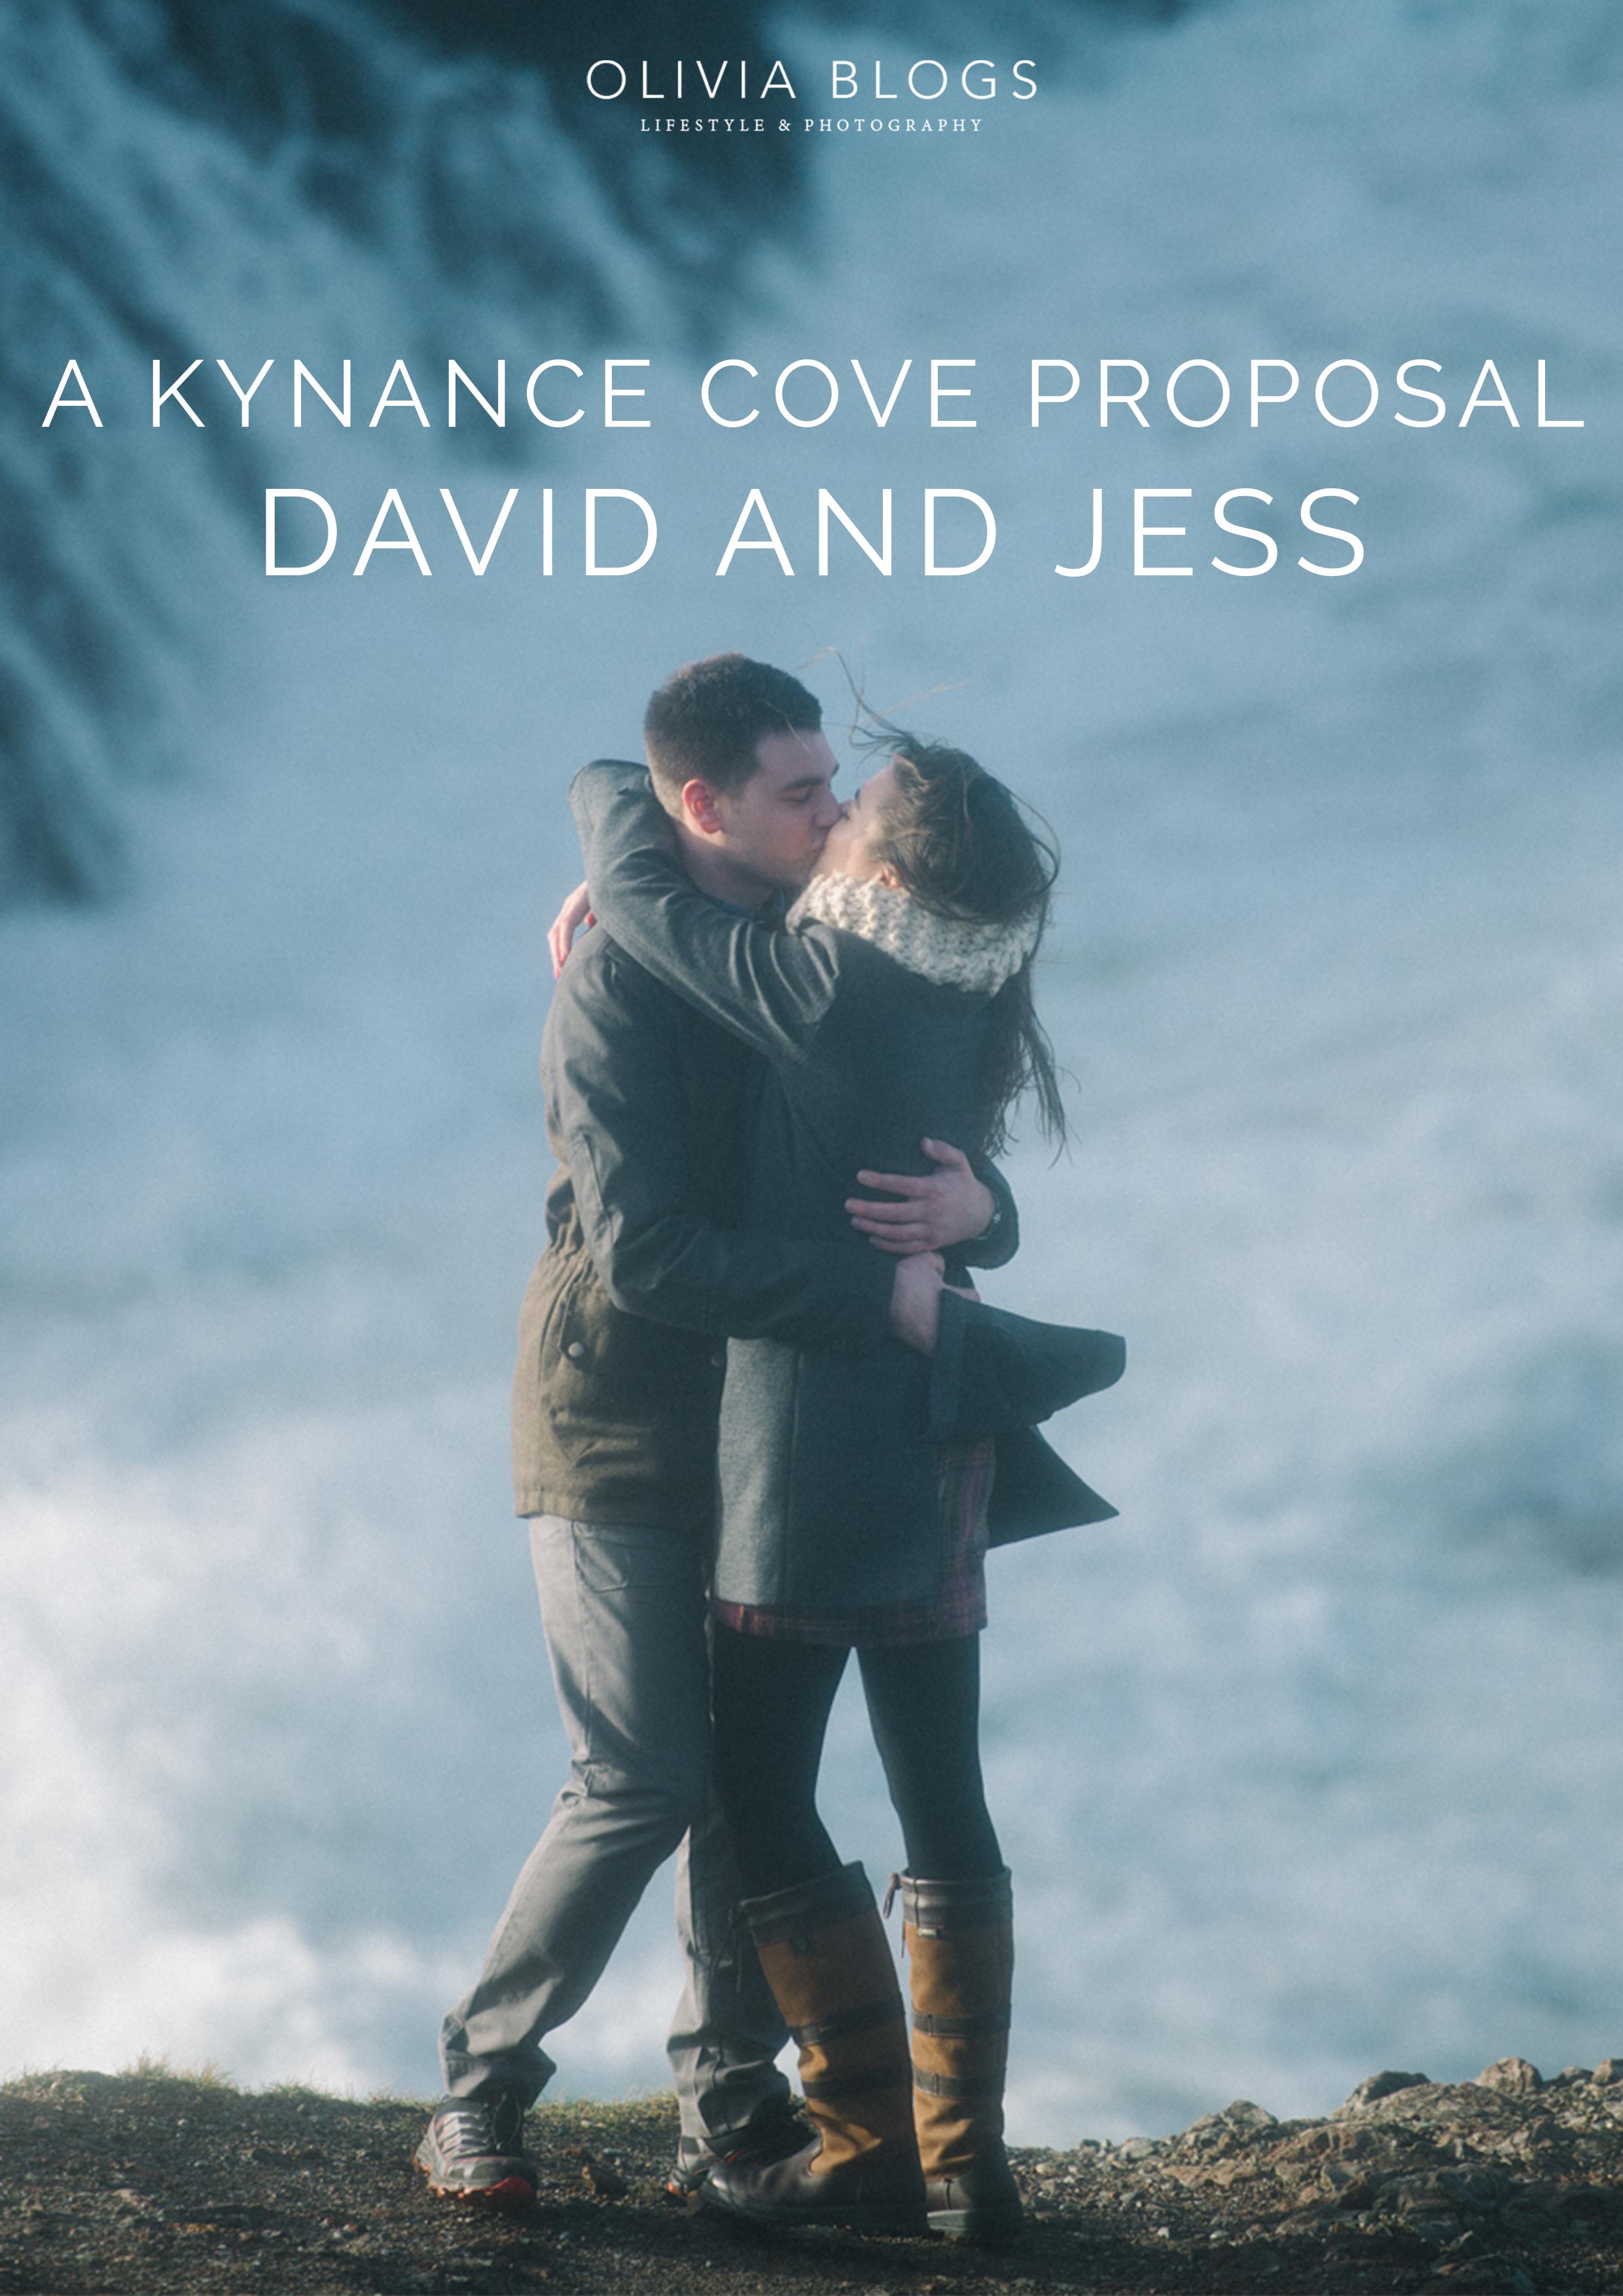 David-and-jess-proposal2.jpg